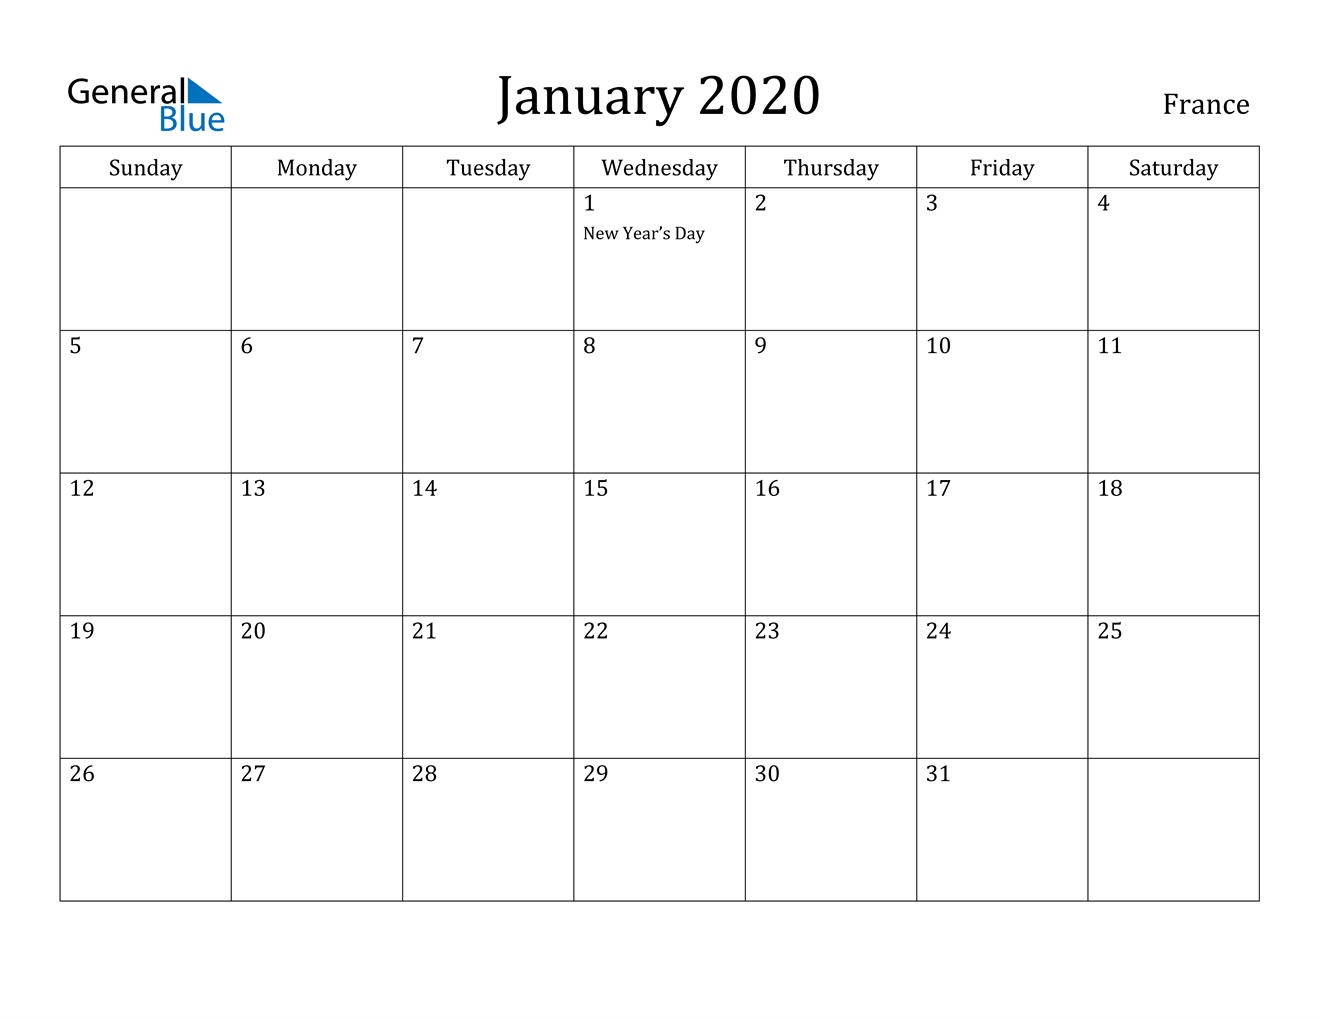 Image of January 2020 France Calendar with Holidays Calendar